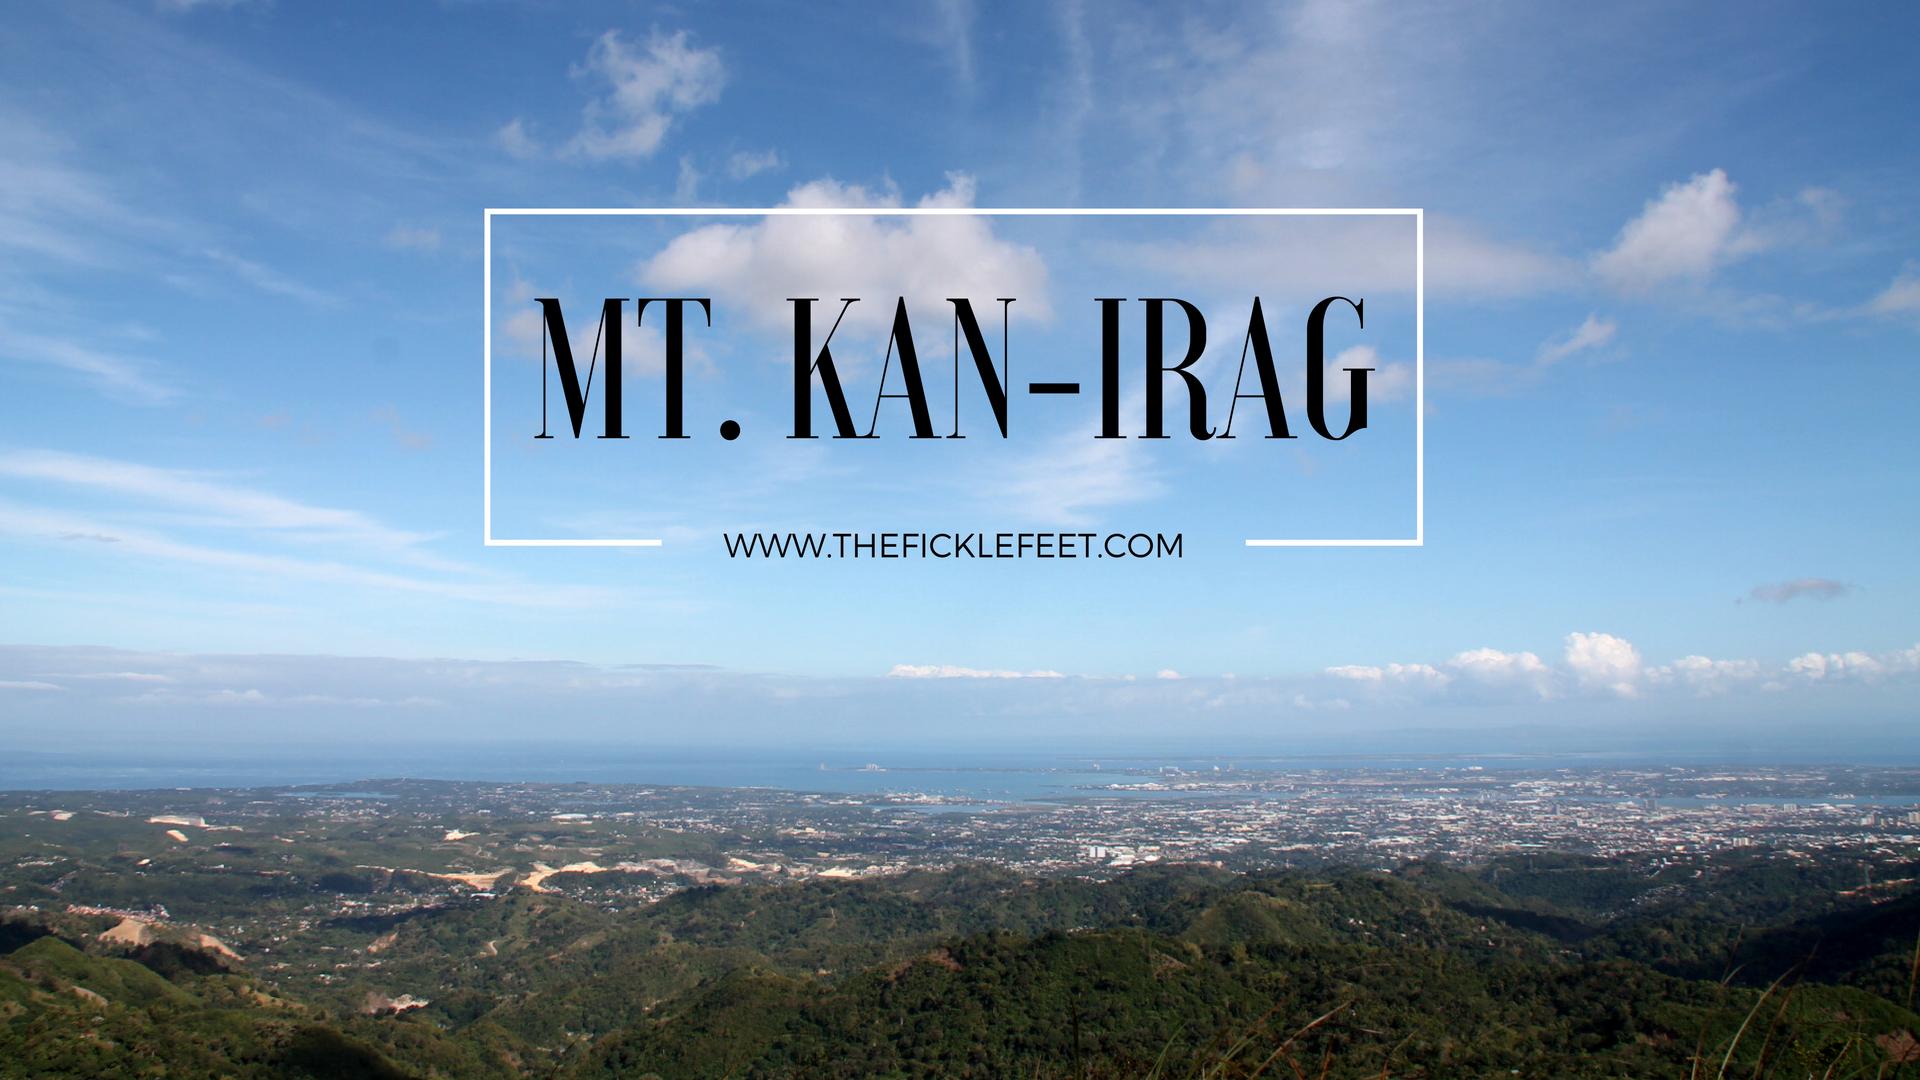 Mt. Kan-irag, Cebu, Philippines